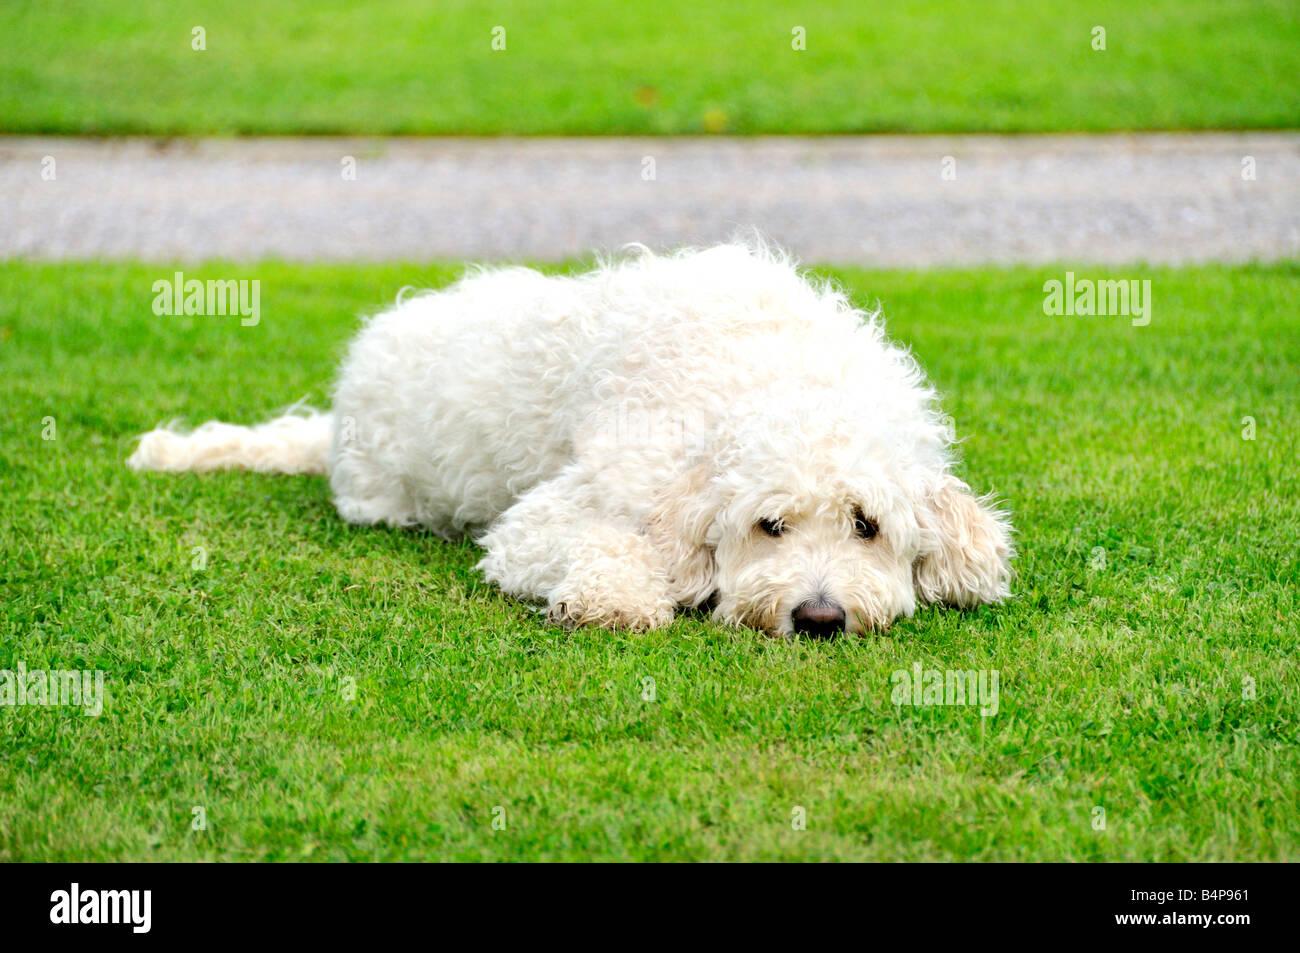 White goldendoodle dog sitting lying outside on grass Stock Photo